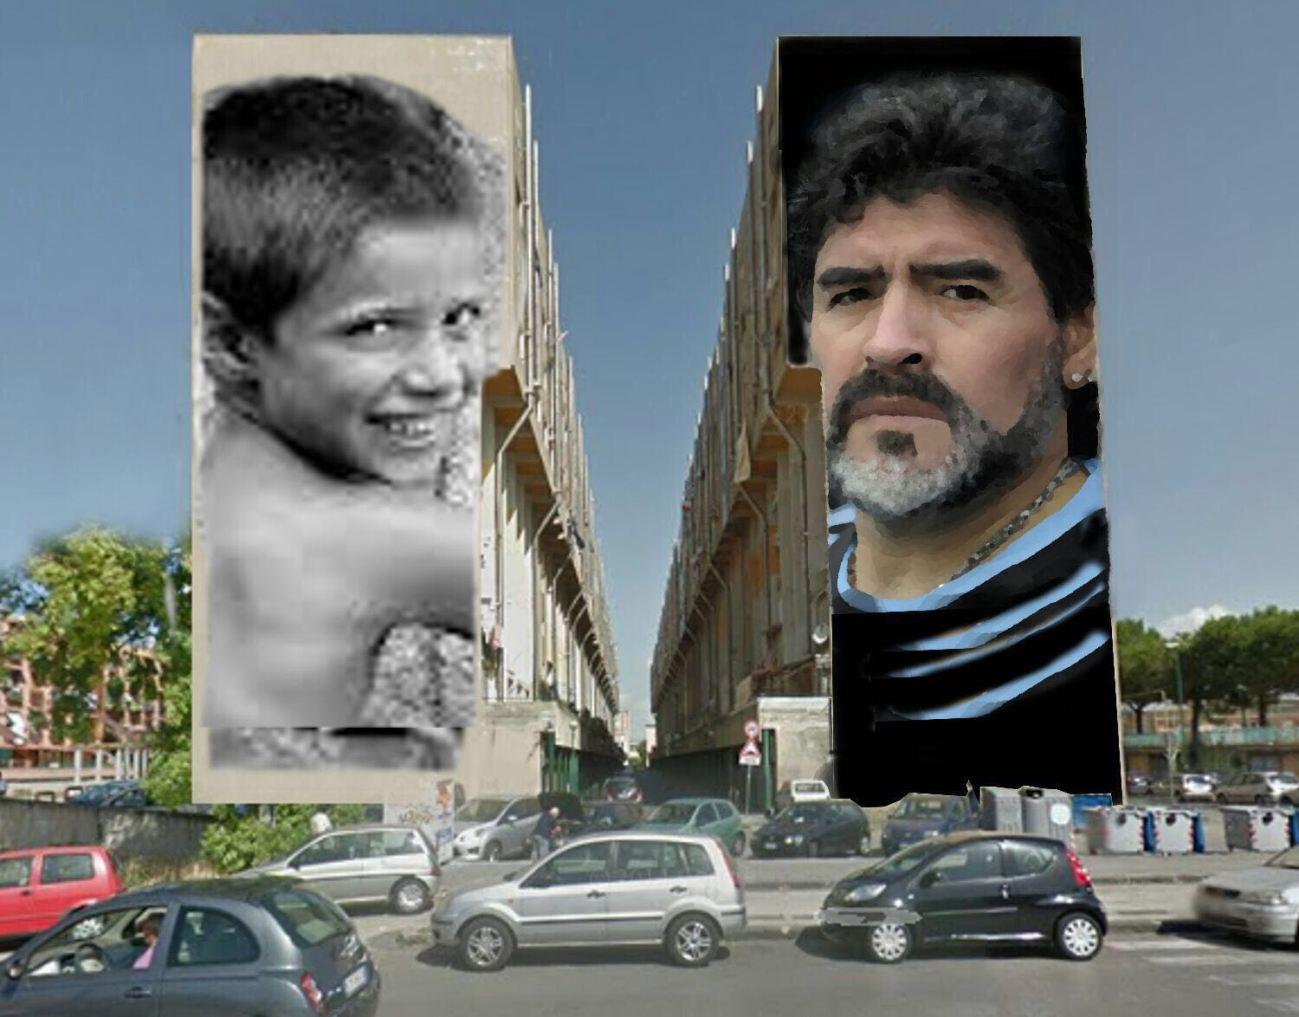 via taverna del ferro san giovanni murales jorit agoch diego maradona